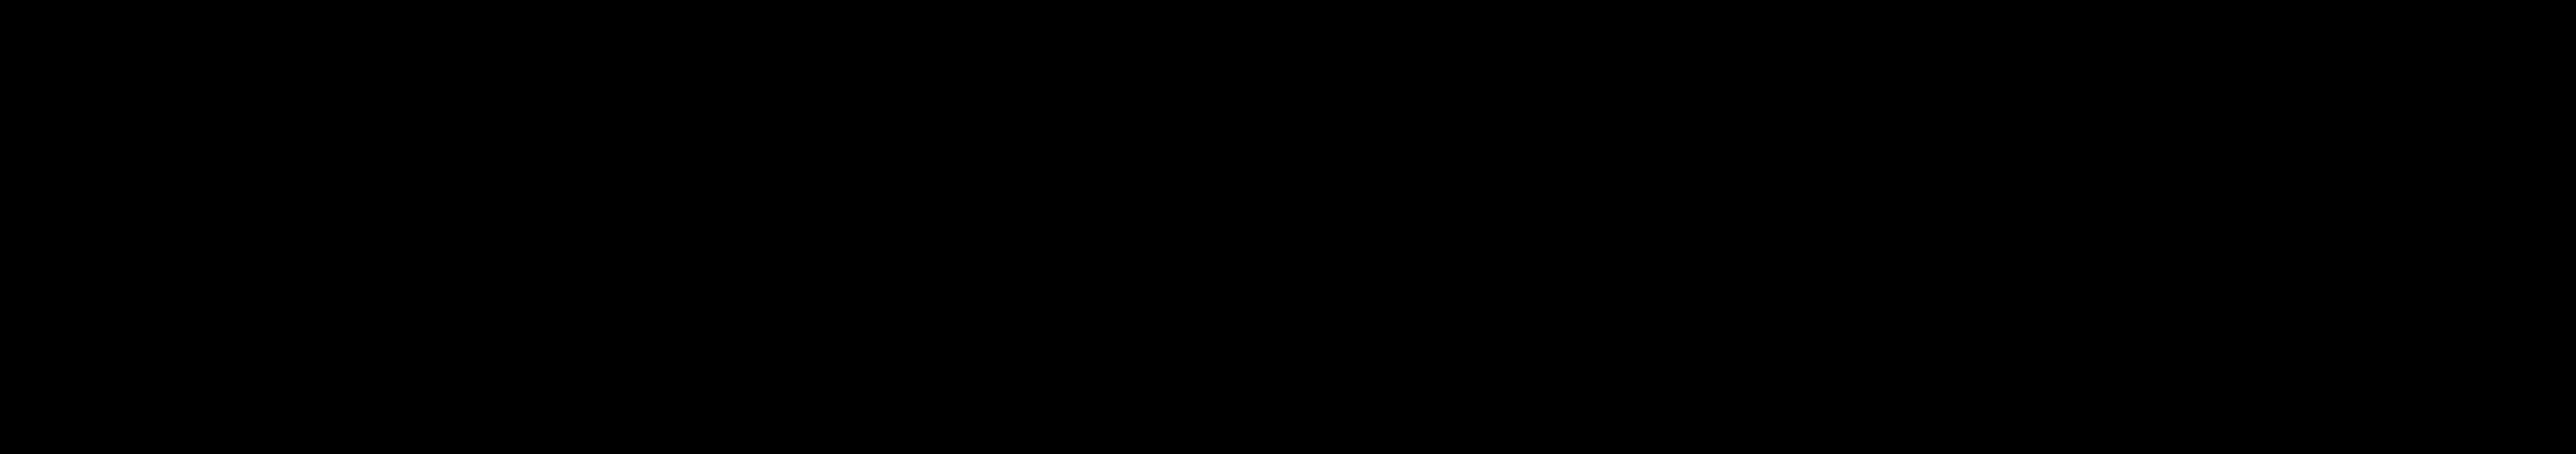 hdmi logo 1 - HDMI Logo